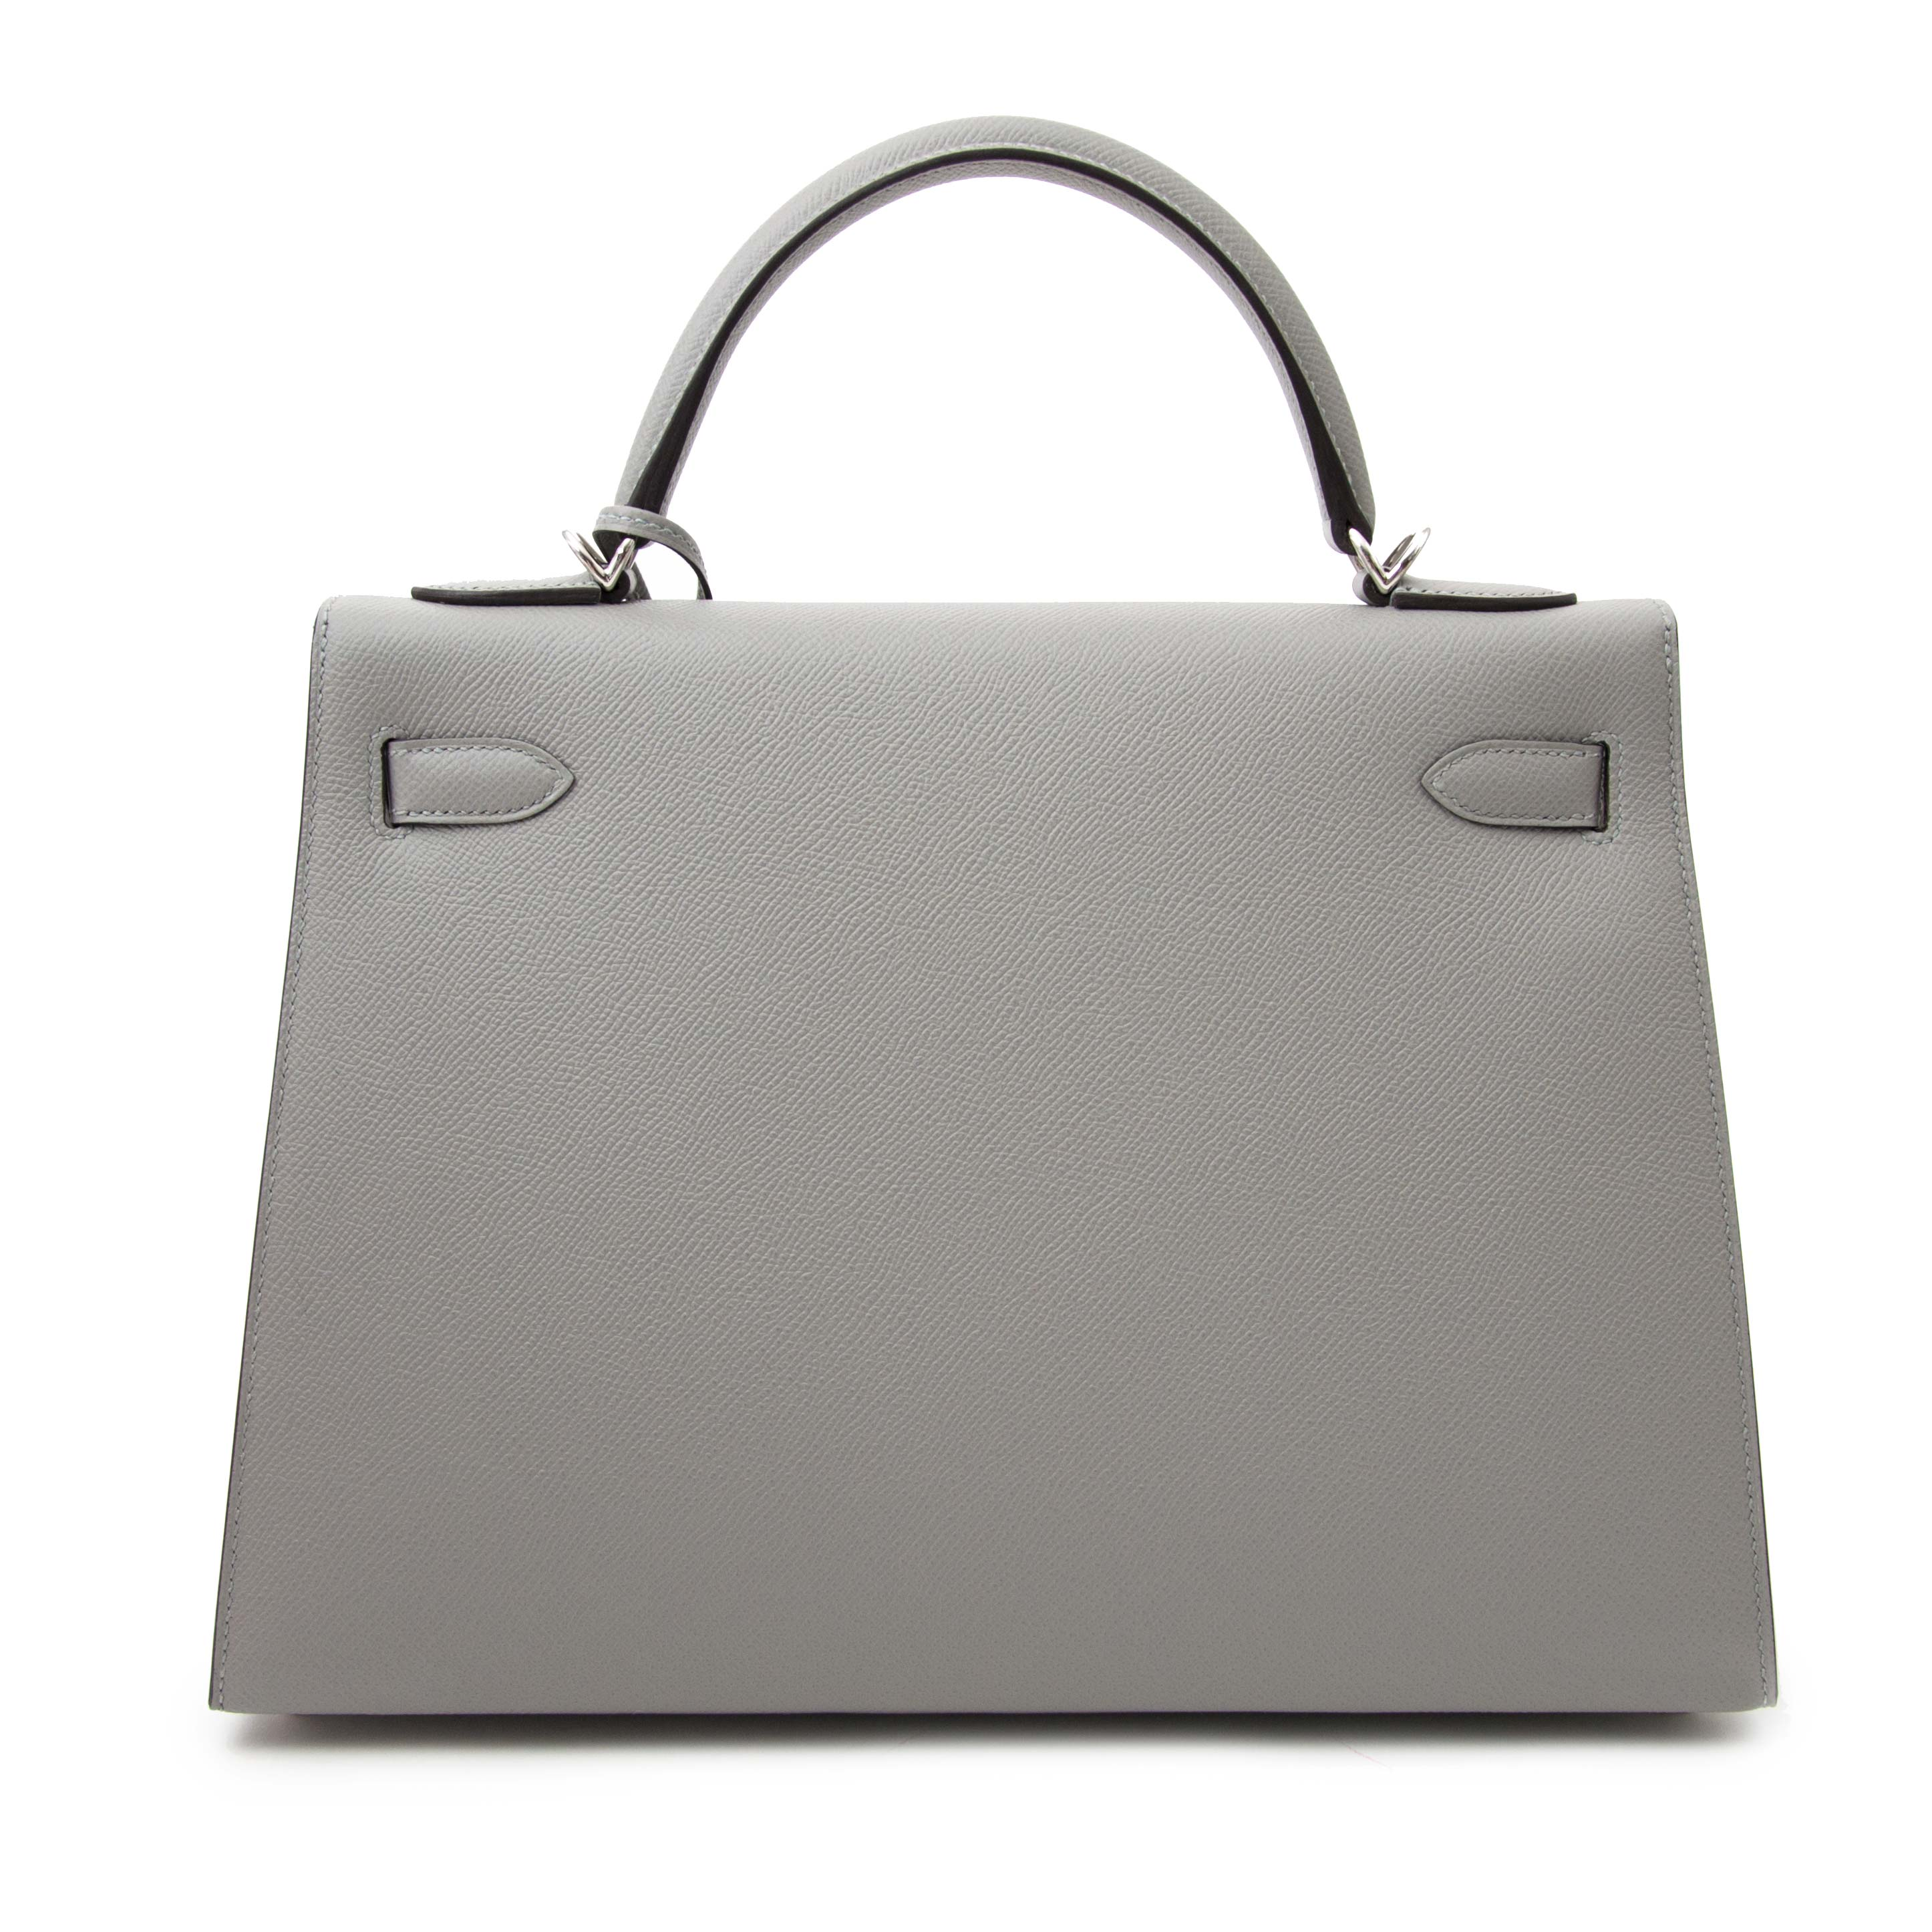 26056868cb2 Hermès Kelly Sellier 32 Epsom Gris Mouette PHW for sale in Antwerp www. labellov.